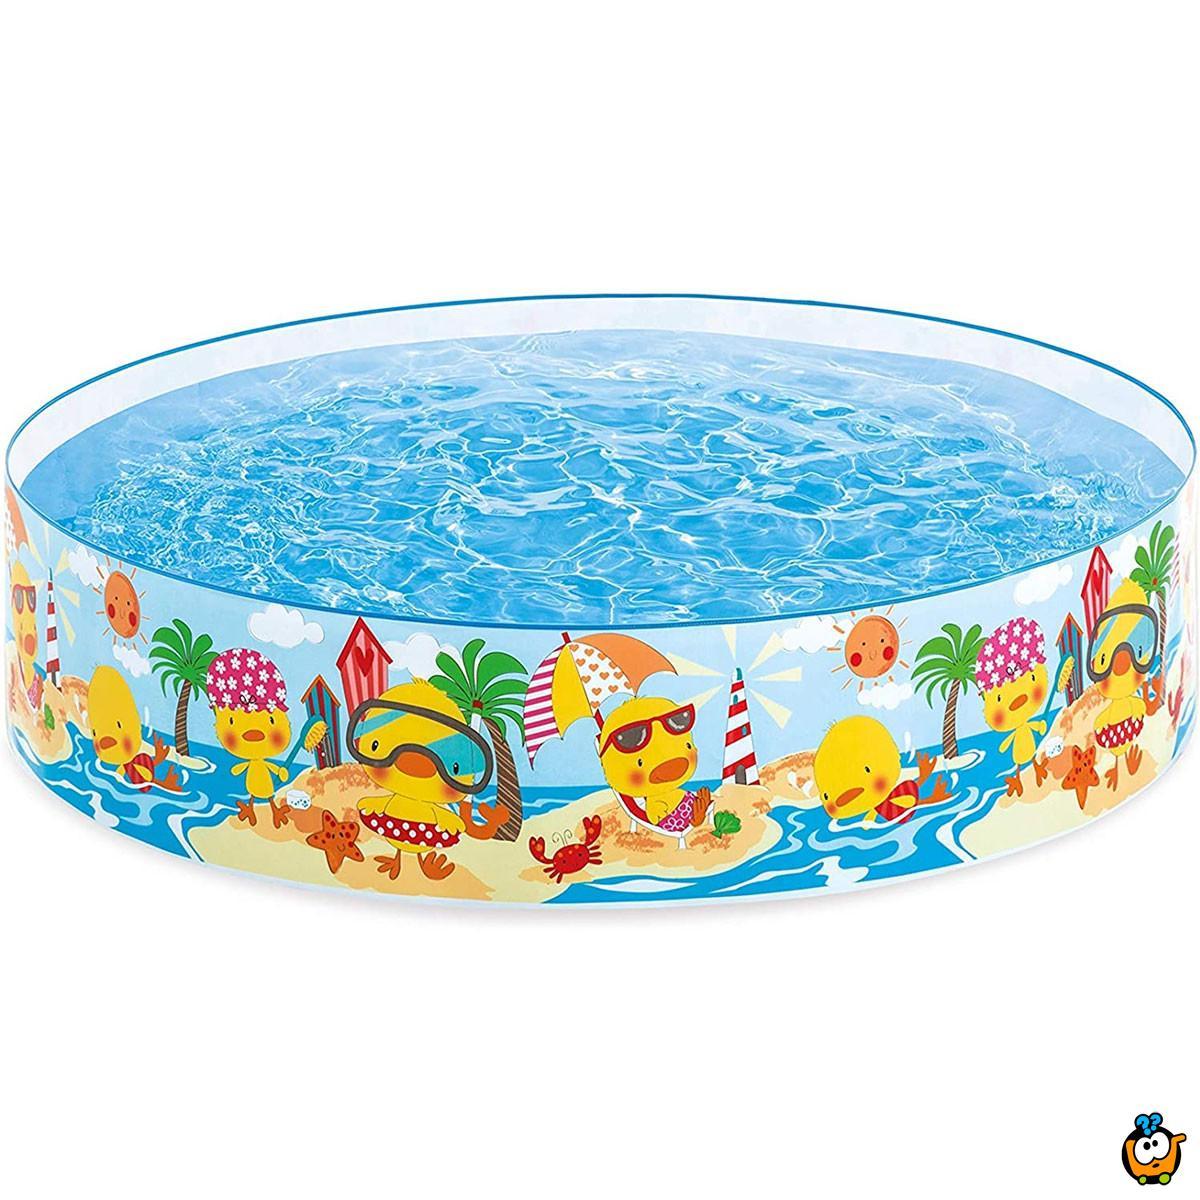 INTEX 58477NP/EP - Ducling Pool - Okrugli bazen pačija družina